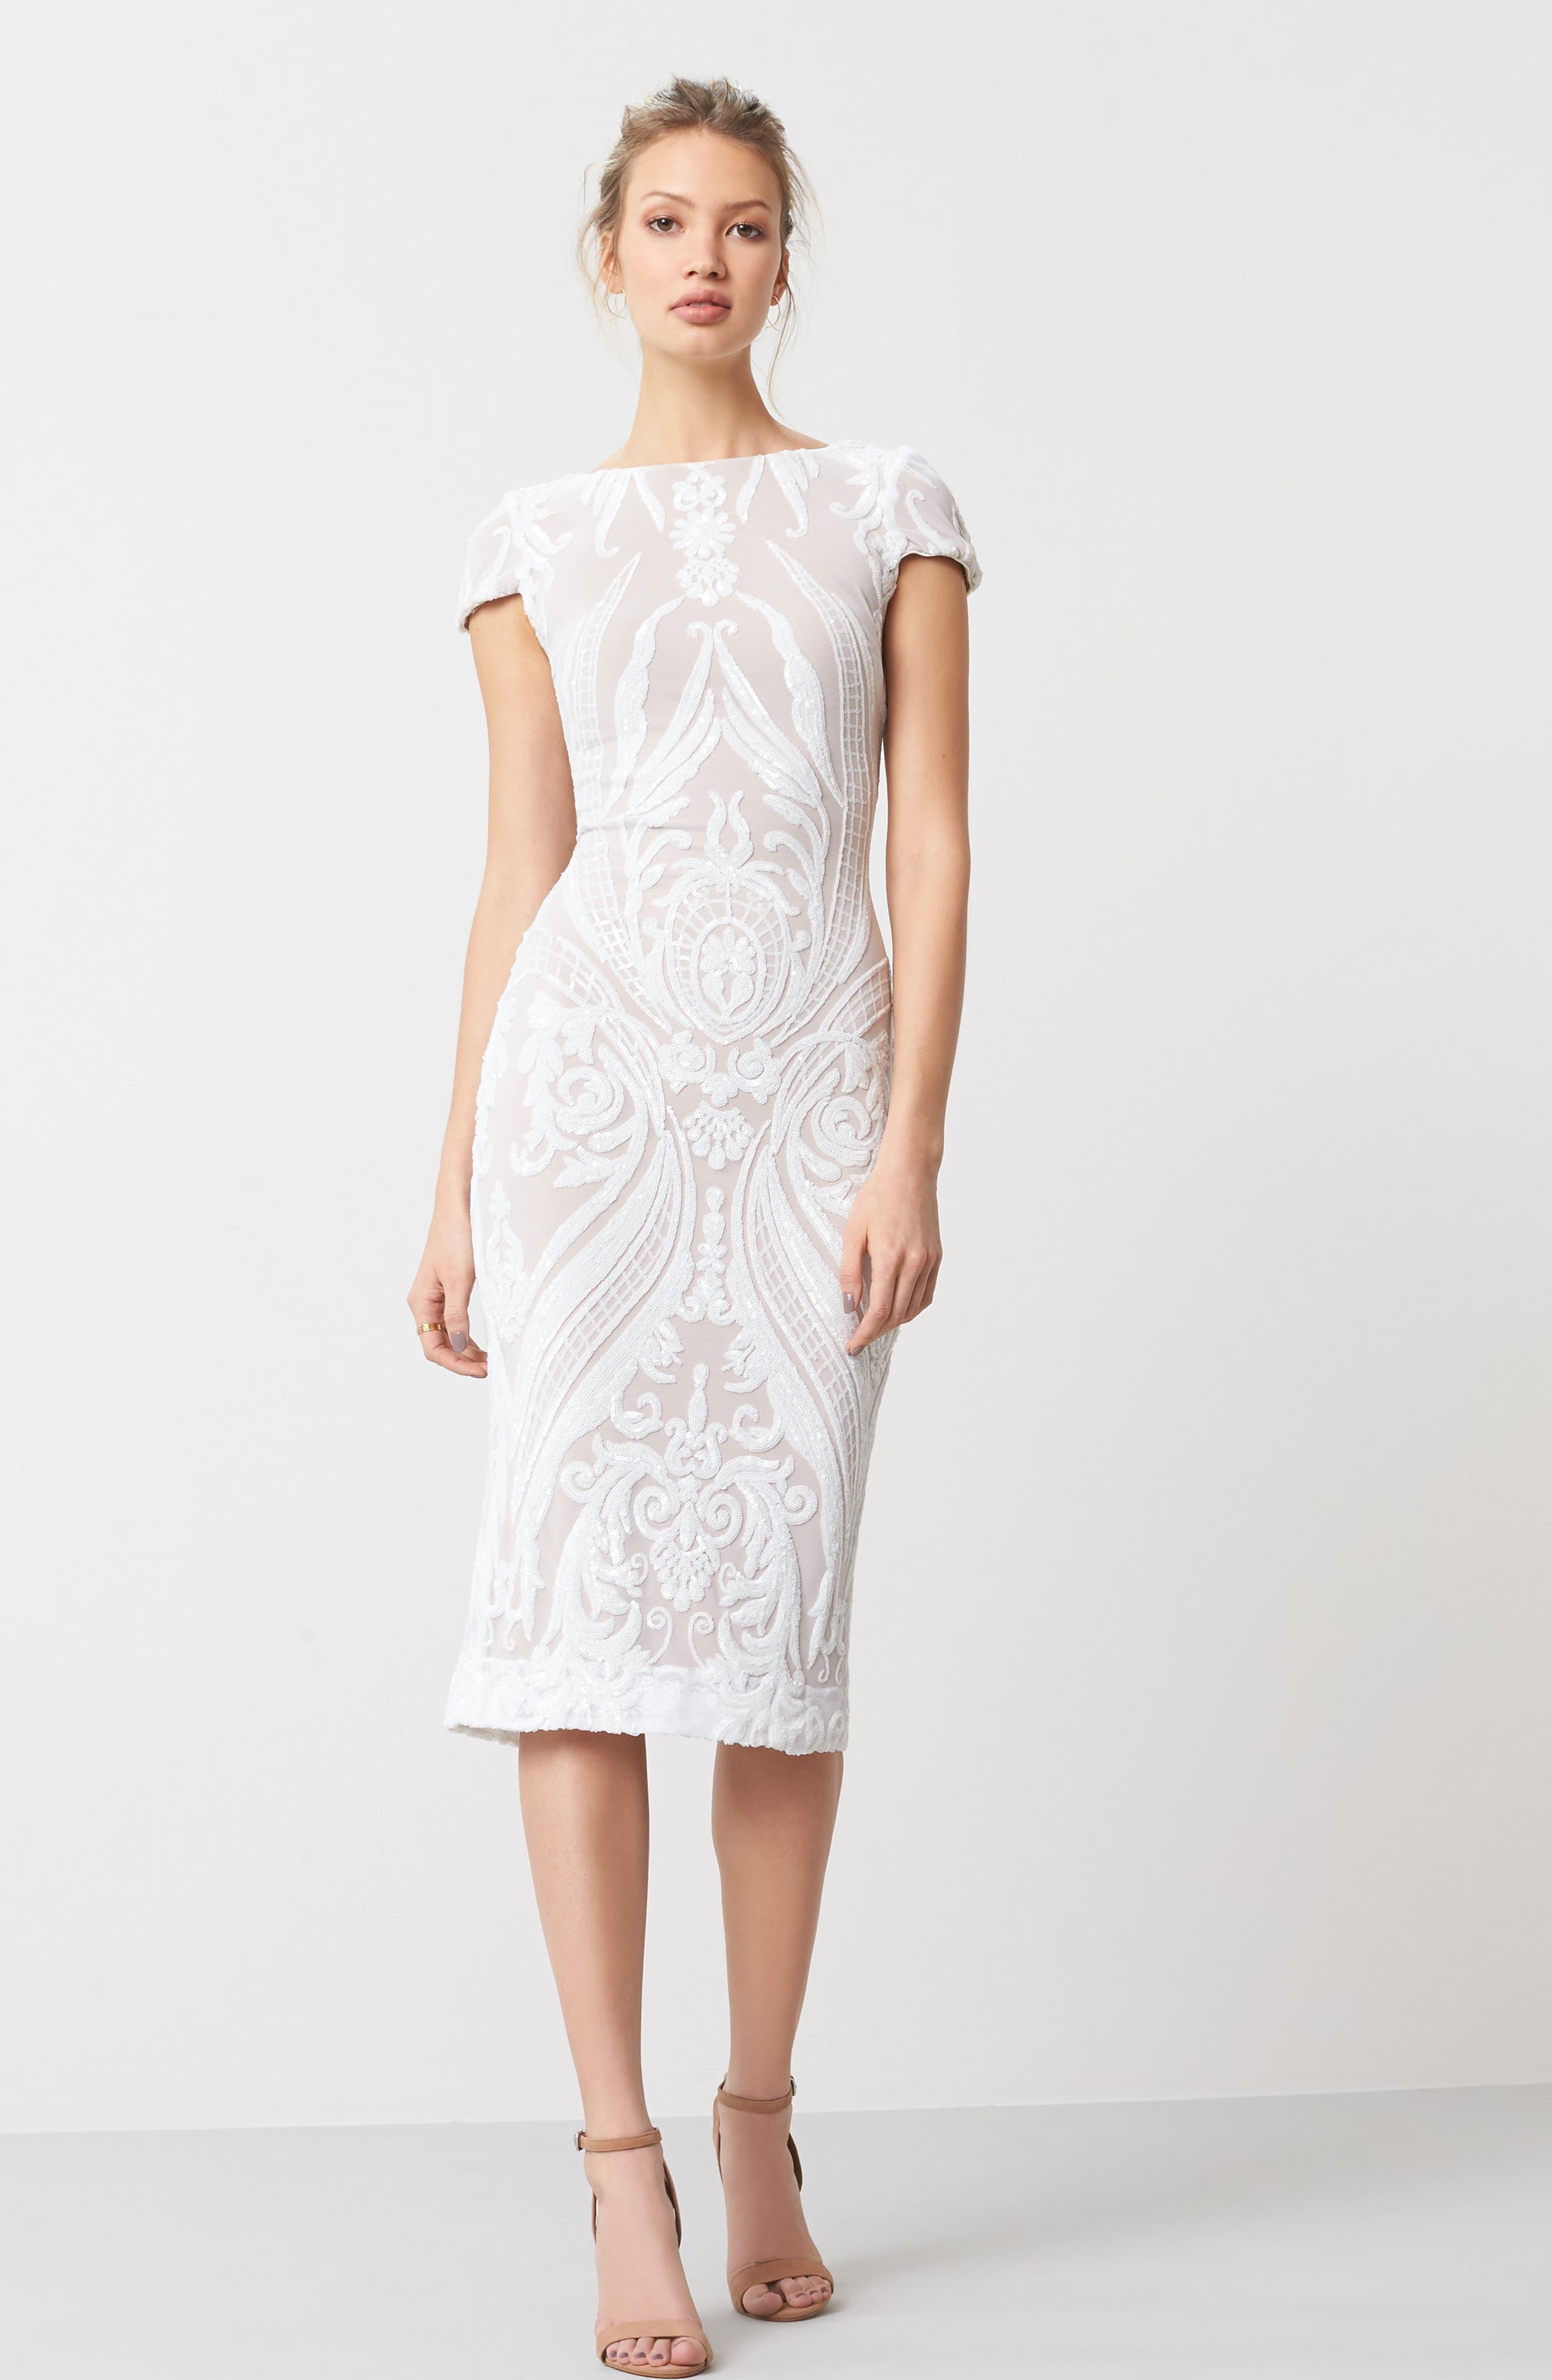 White dress cocktail - White Dress Cocktail 11